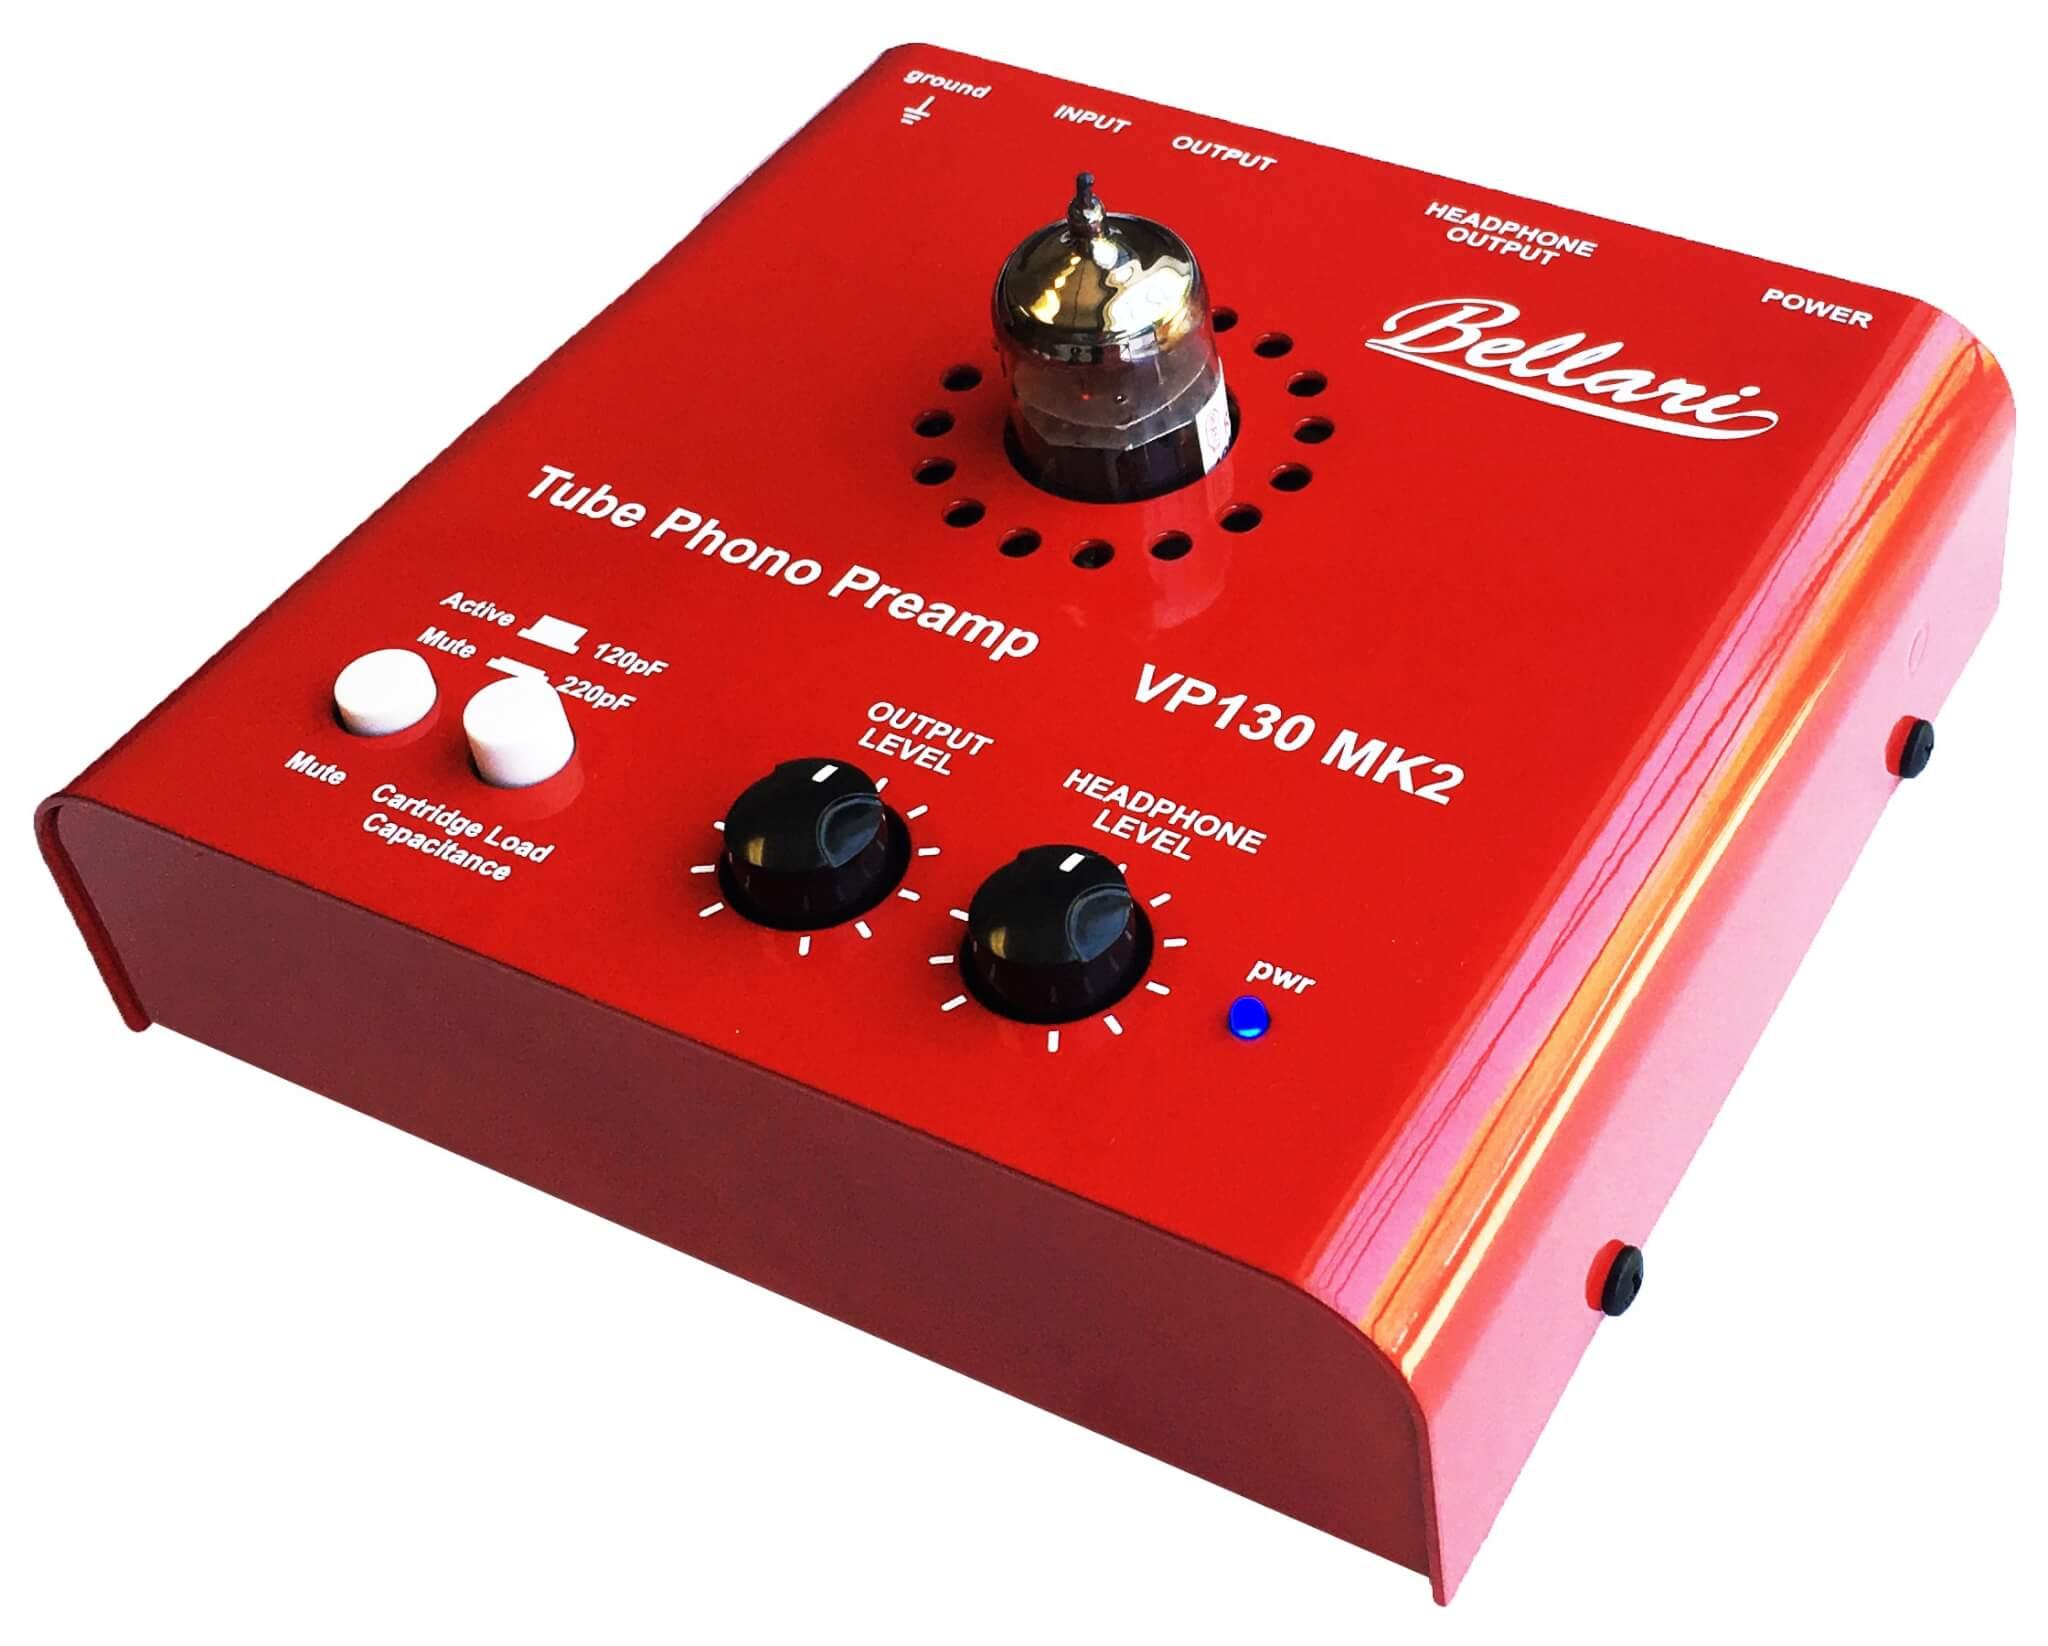 VP130 MK2 - Tube Phono Preamp - Bellari Audio